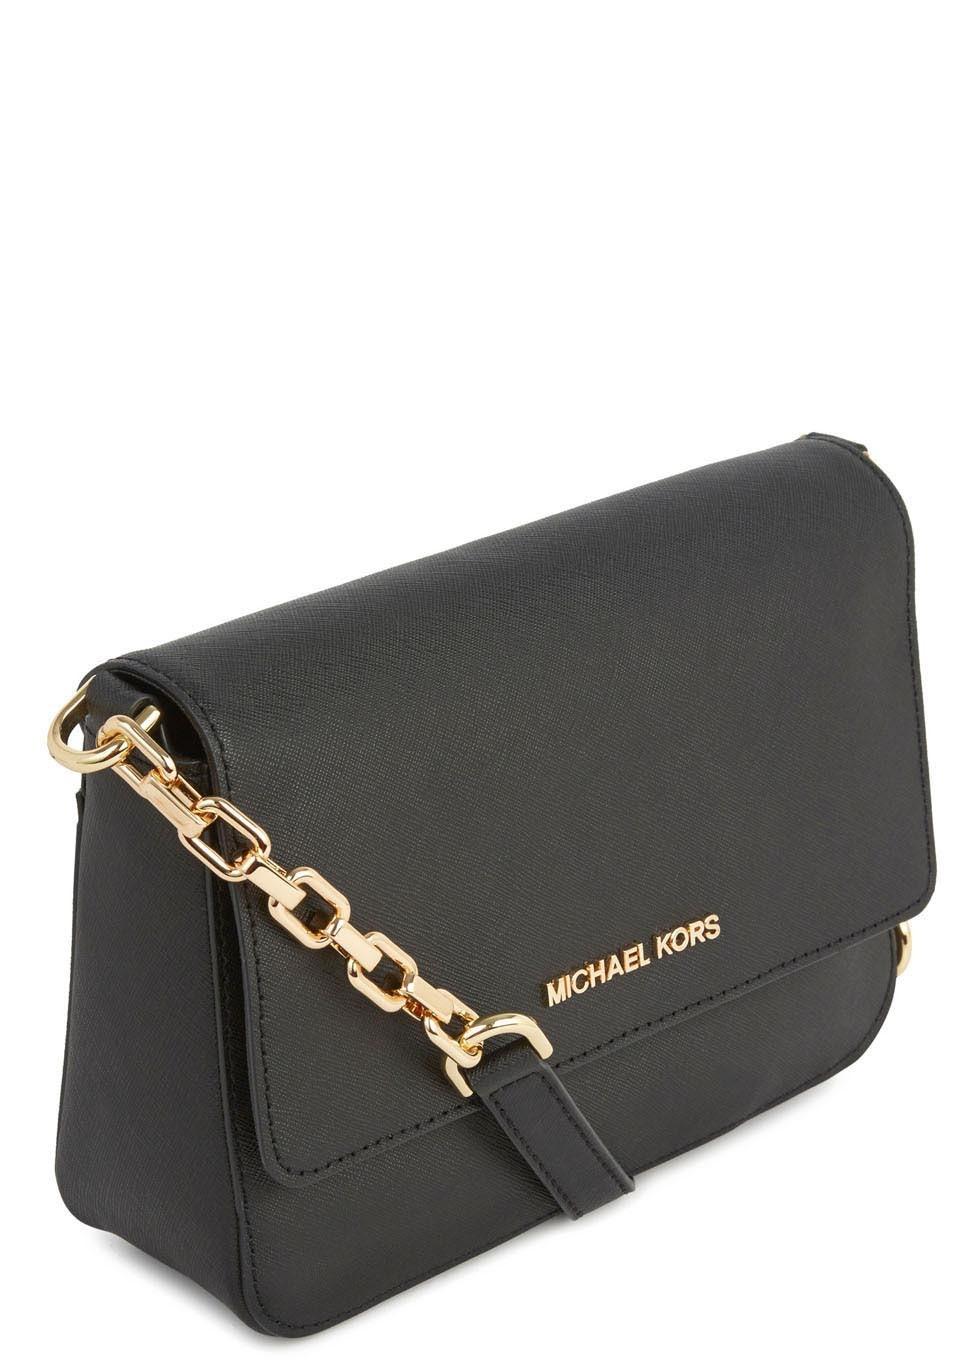 michael kors selma black saffiano leather crossbody bag in